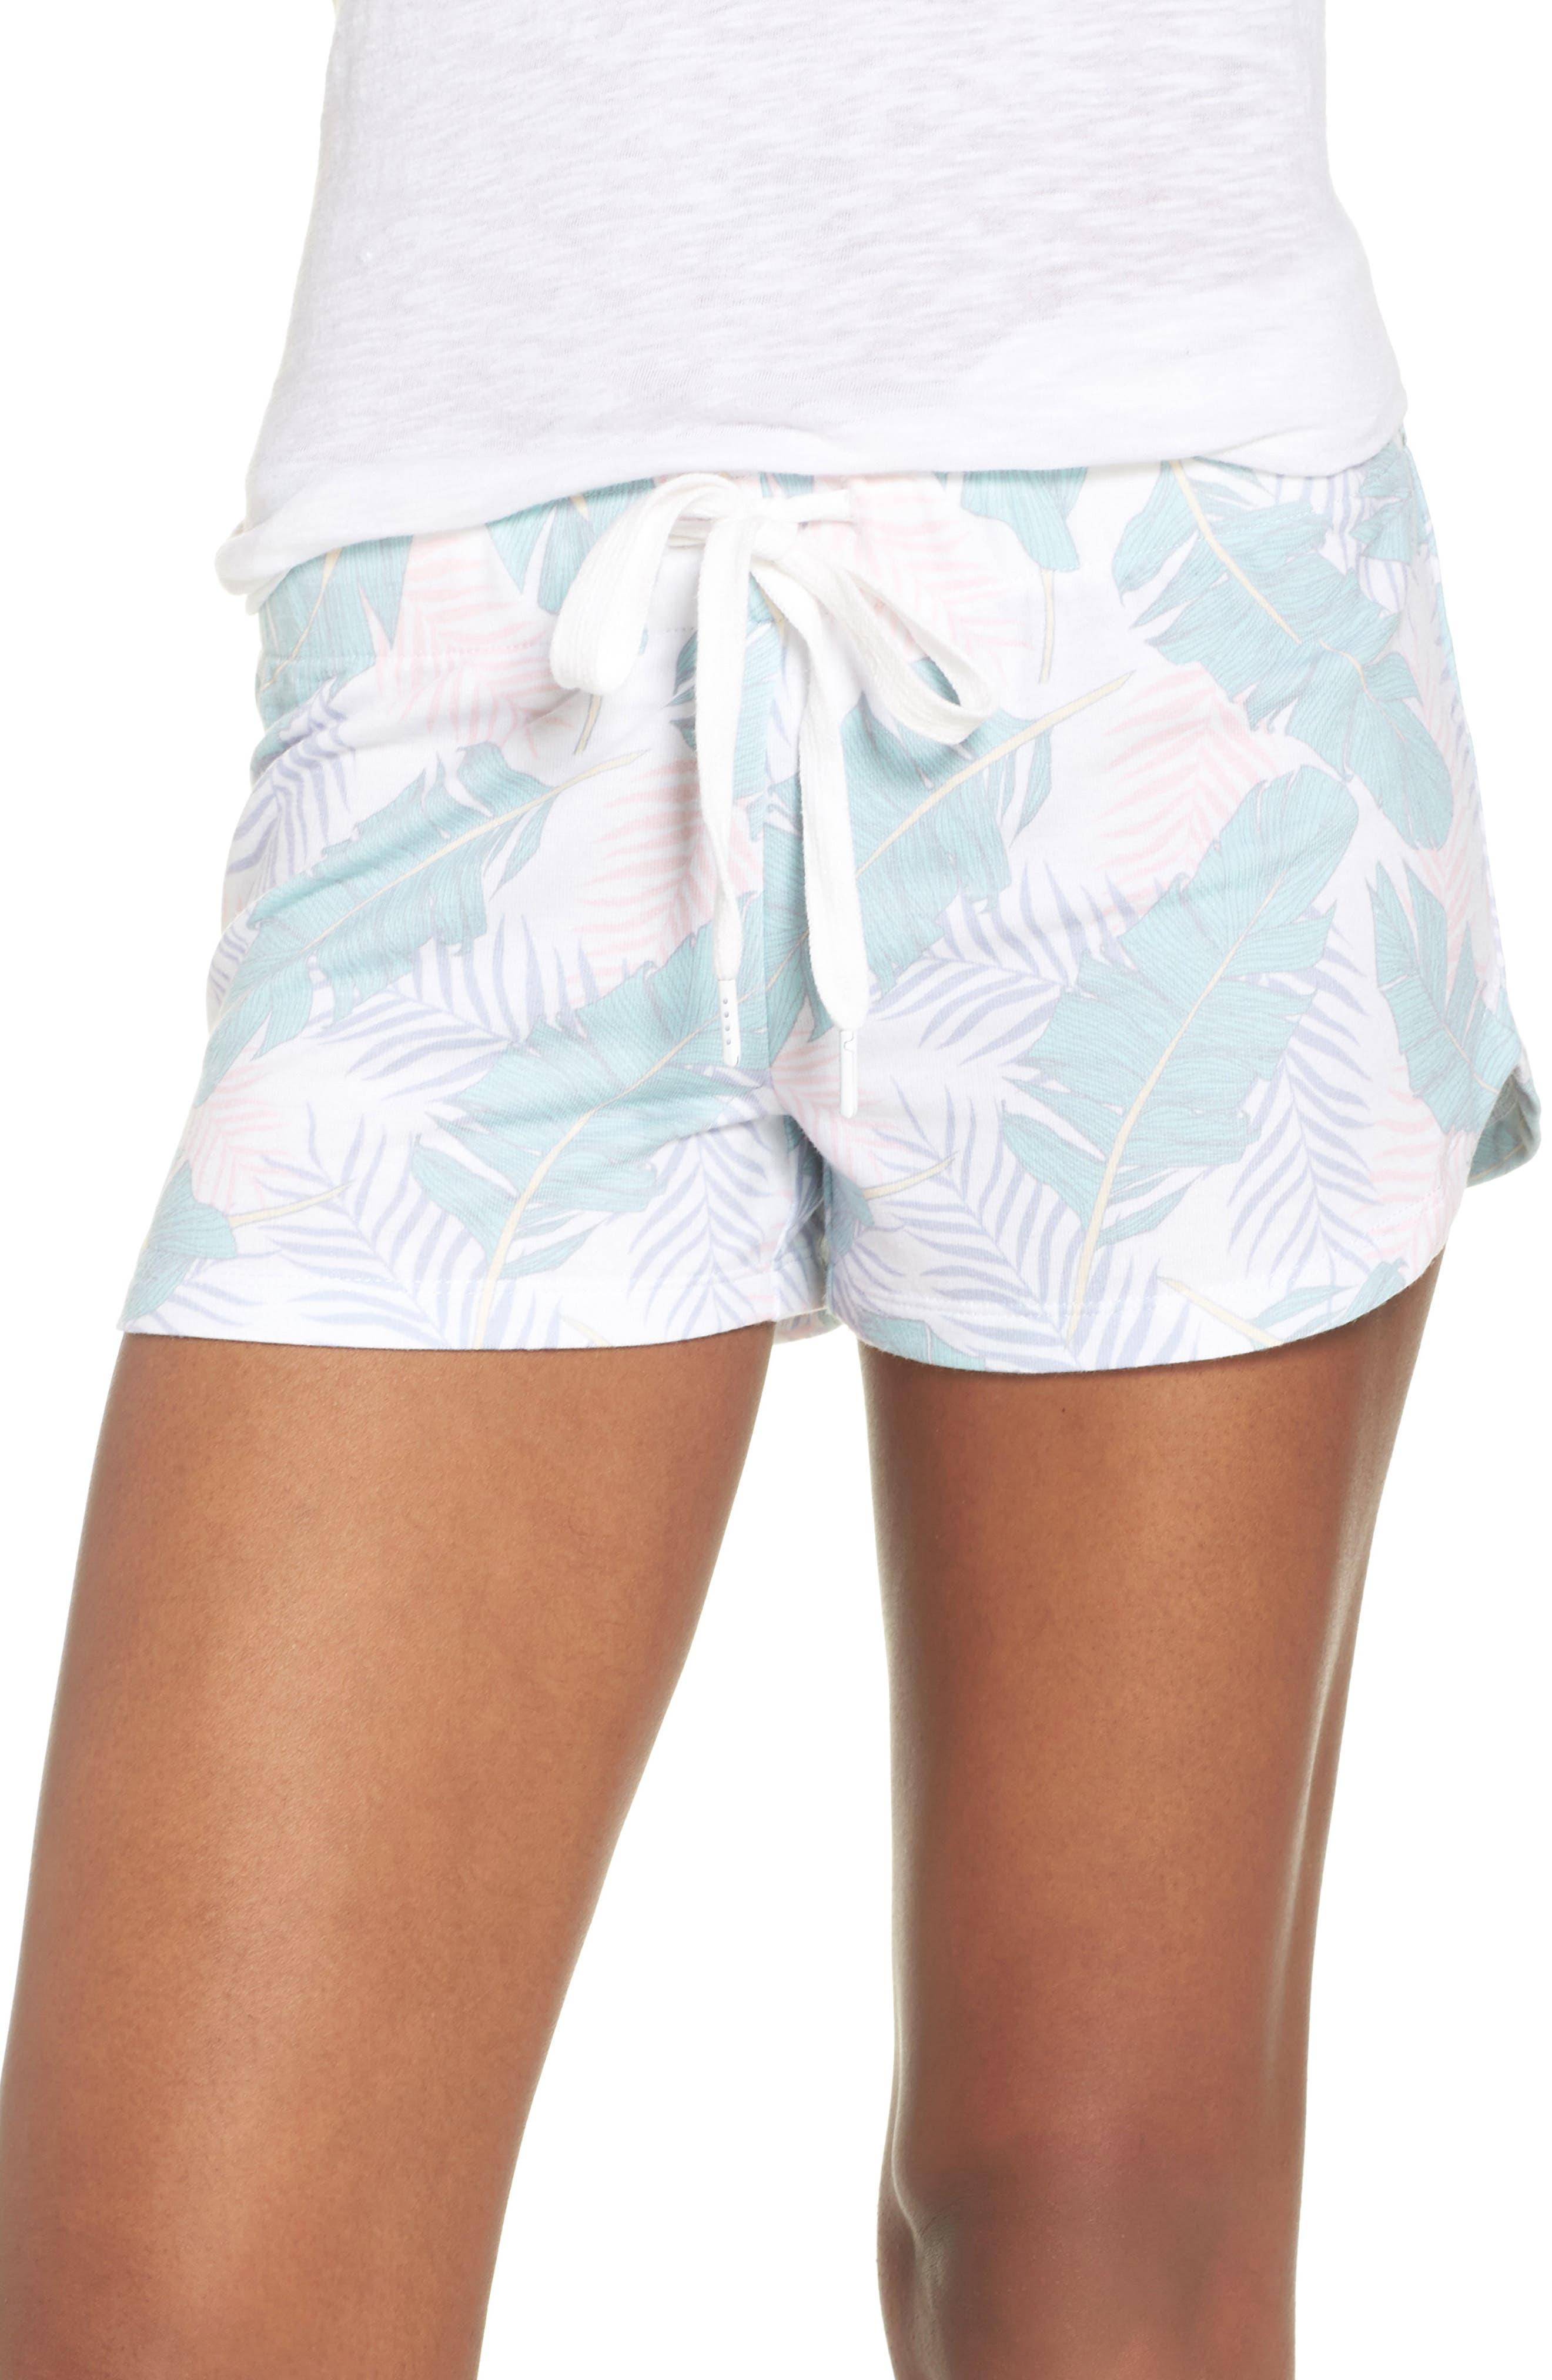 PJ Salvage Lounge Shorts